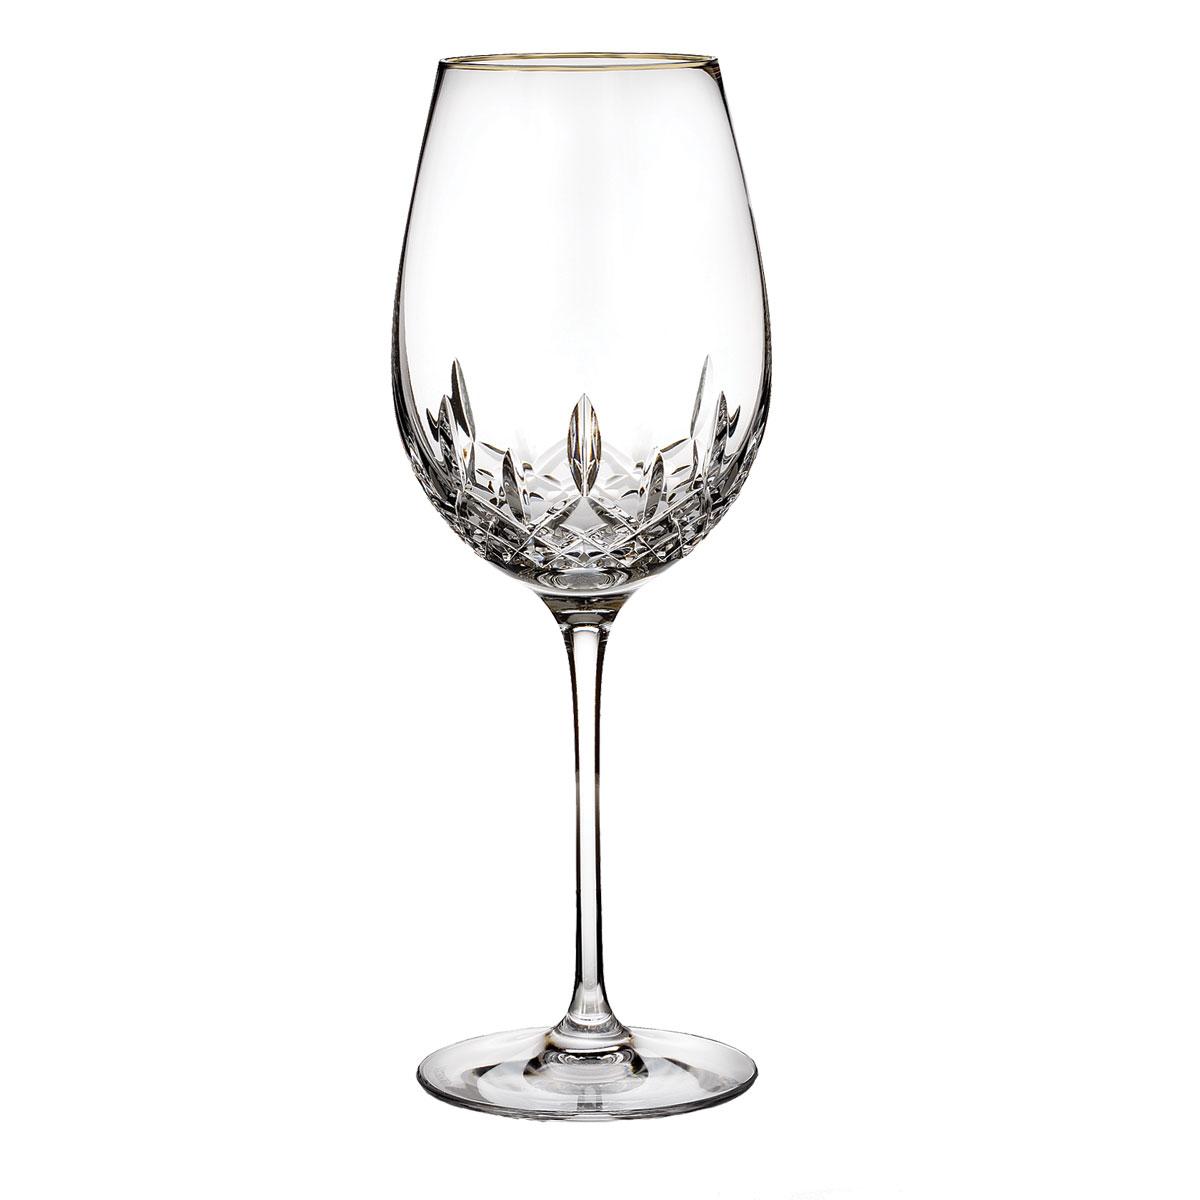 Waterford Crystal, Lismore Essence Gold Crystal Goblet, Single